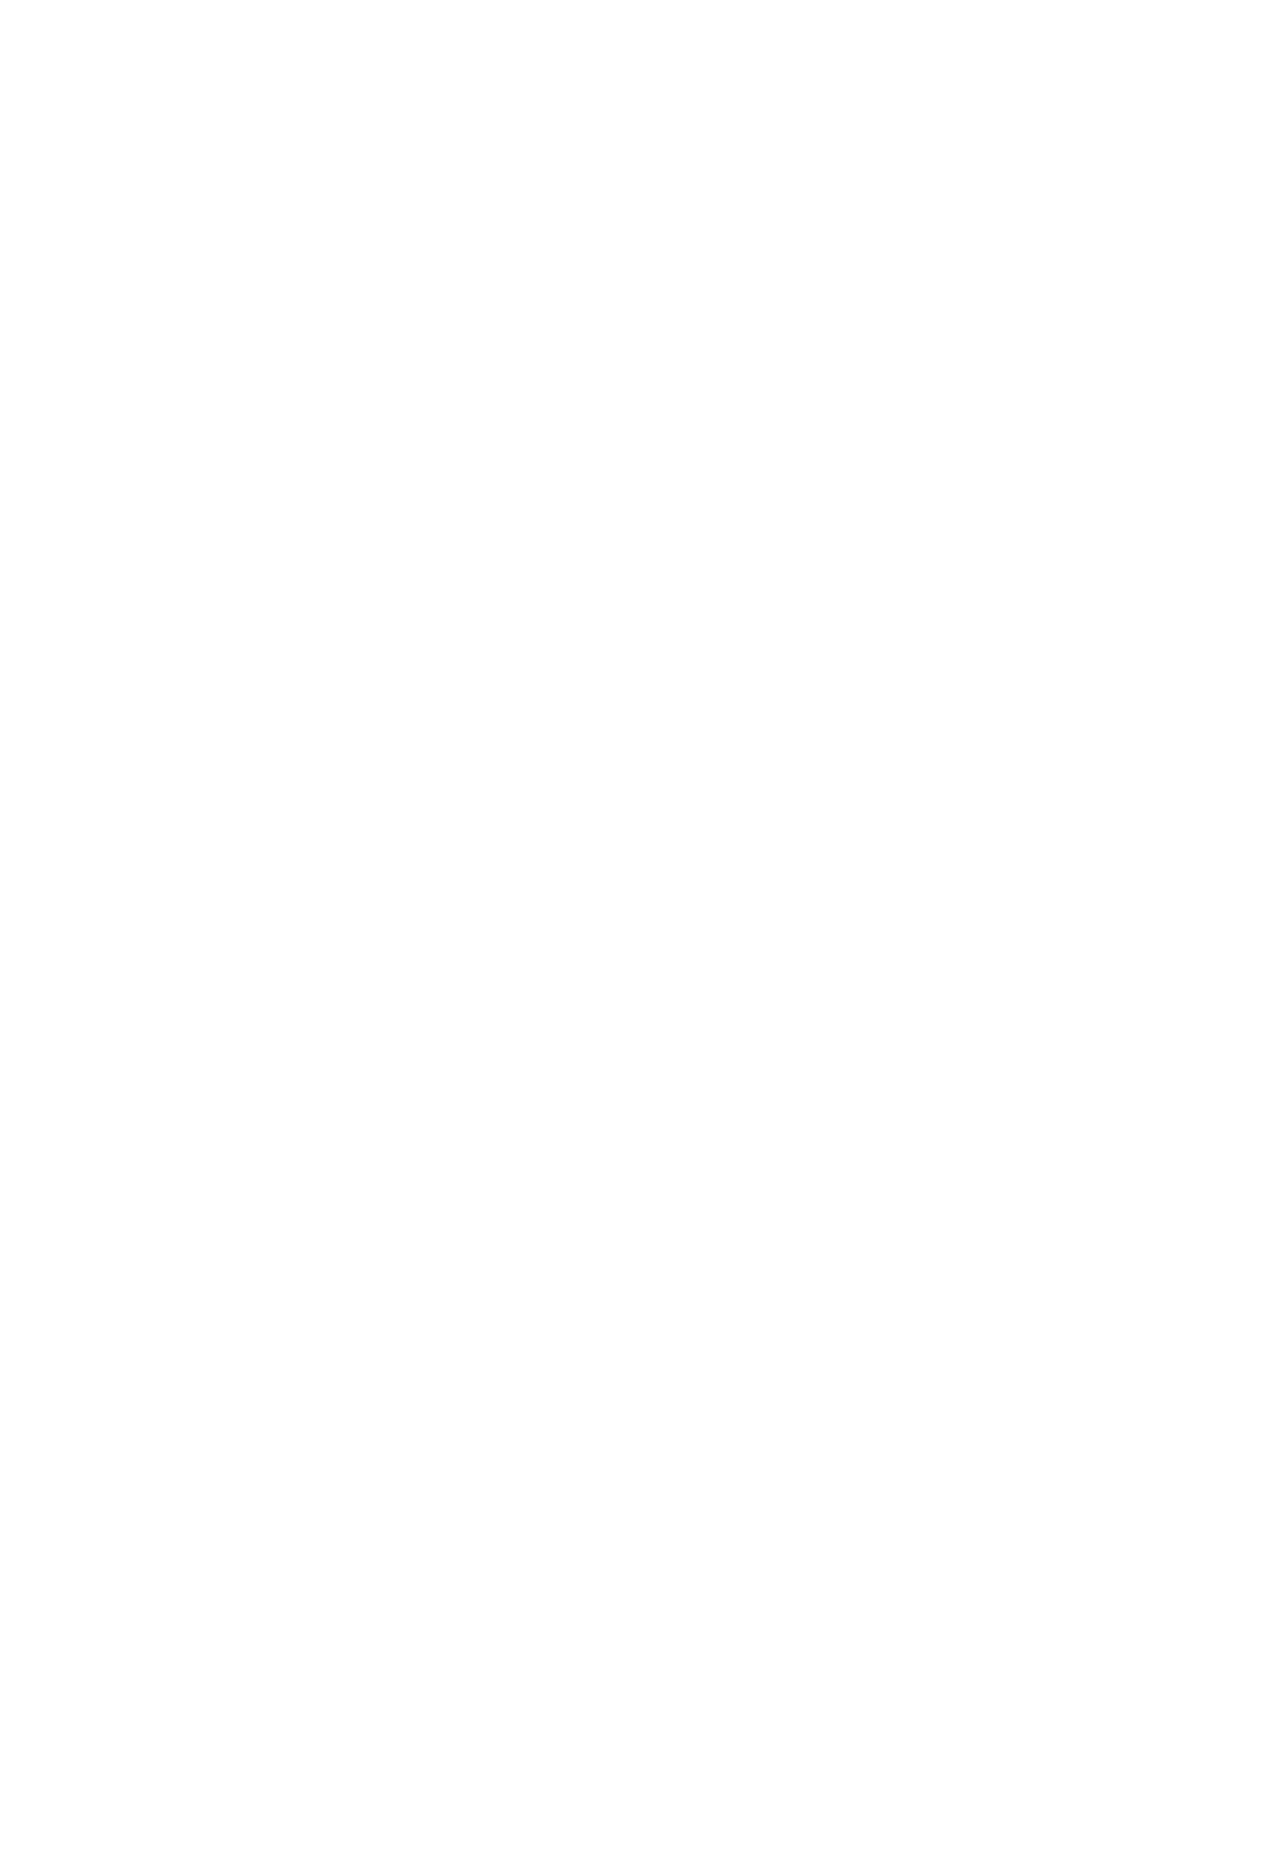 [Tomato Kanzume (Tomatomato)] Cat-chan Kozukuri Daisakusen | Cat-chan's Childmaking Grand Strategy (Fate/Grand Order) [English] [Kemonomimi Saikou] [Digital] 22